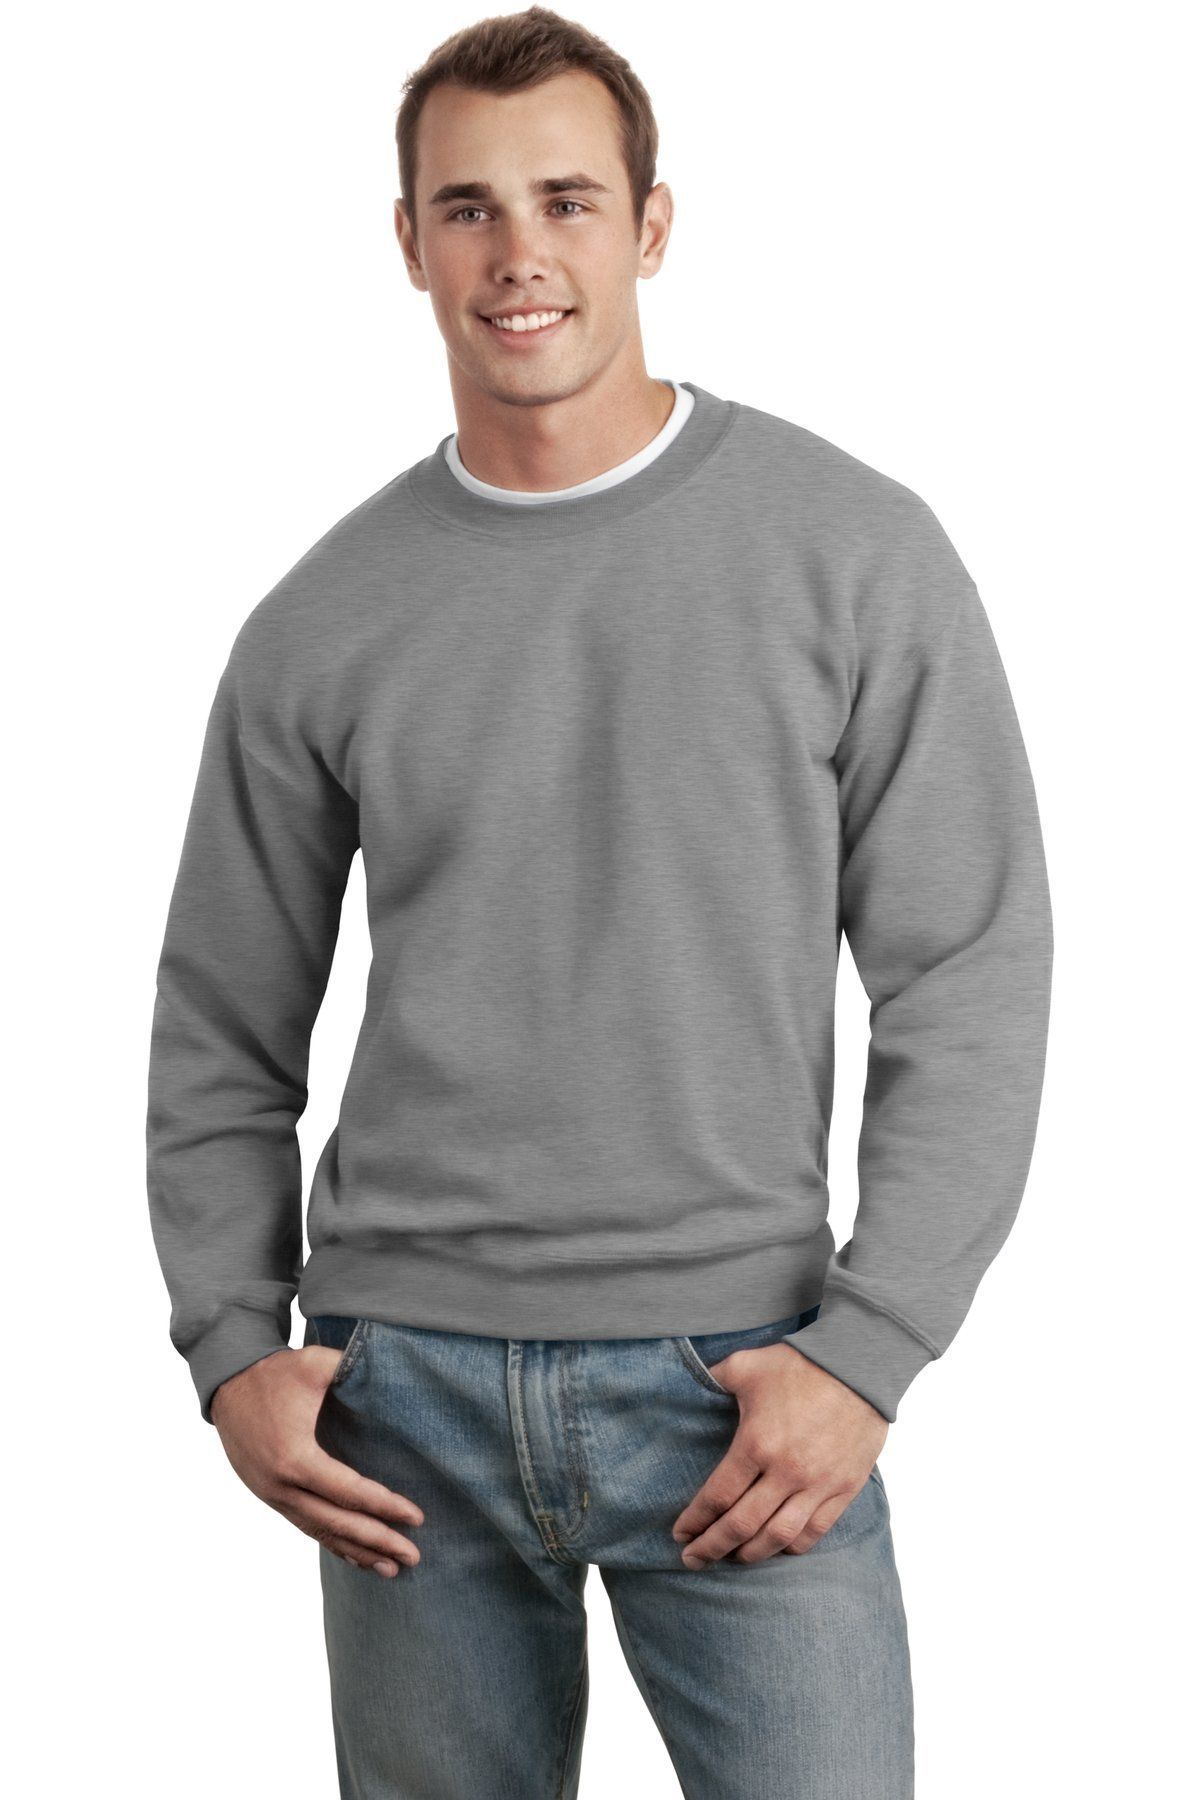 Gildan Mens DryBlend Crewneck Sweatshirt Blank 12000 Up to 3XL